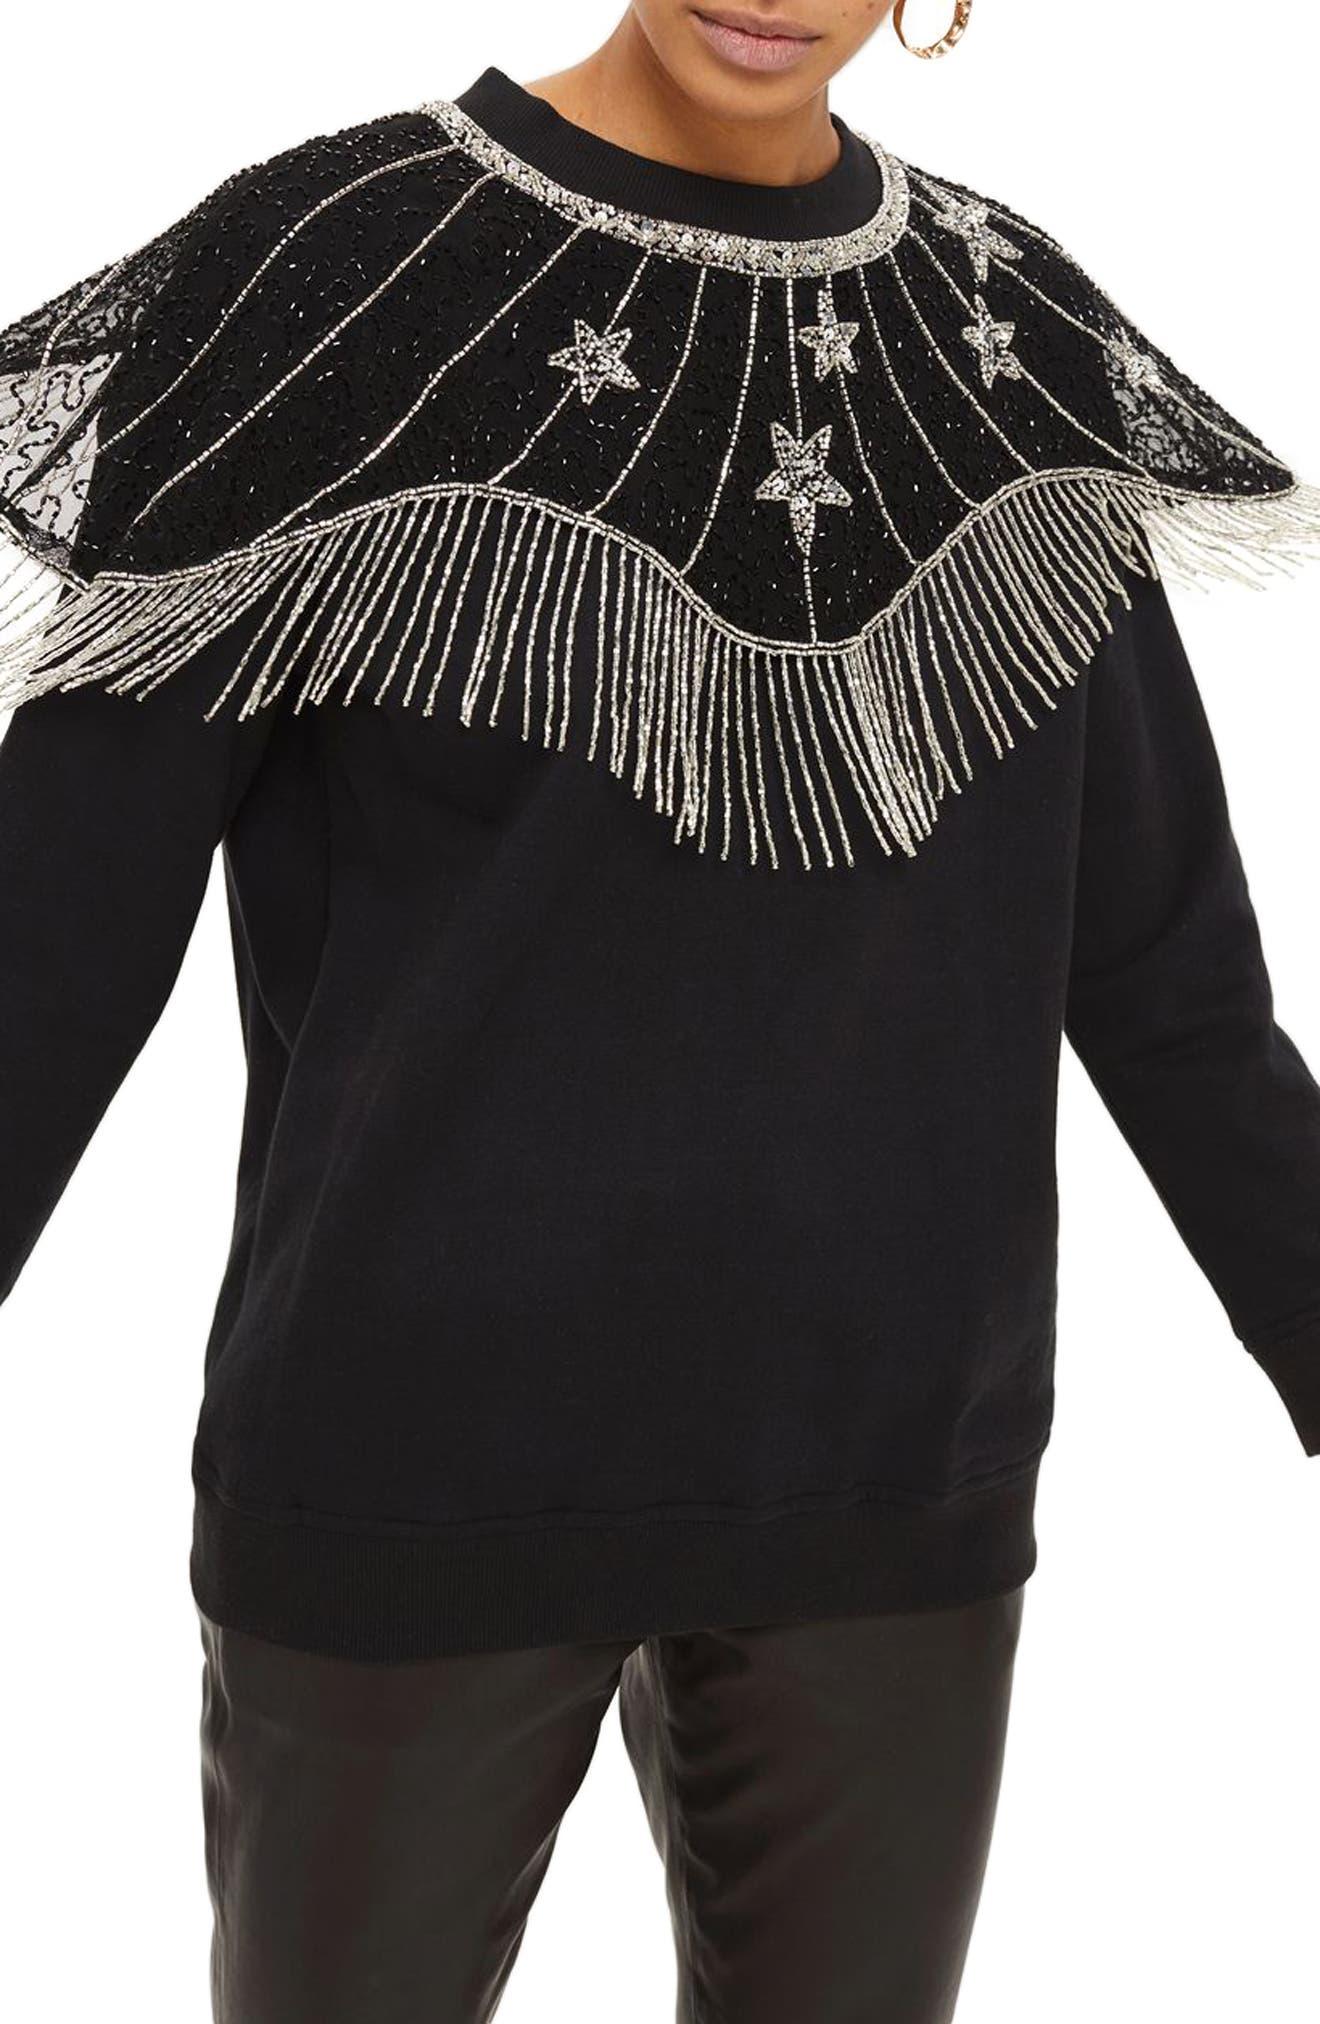 Star Cape Embellished Sweatshirt,                             Main thumbnail 1, color,                             Black Multi